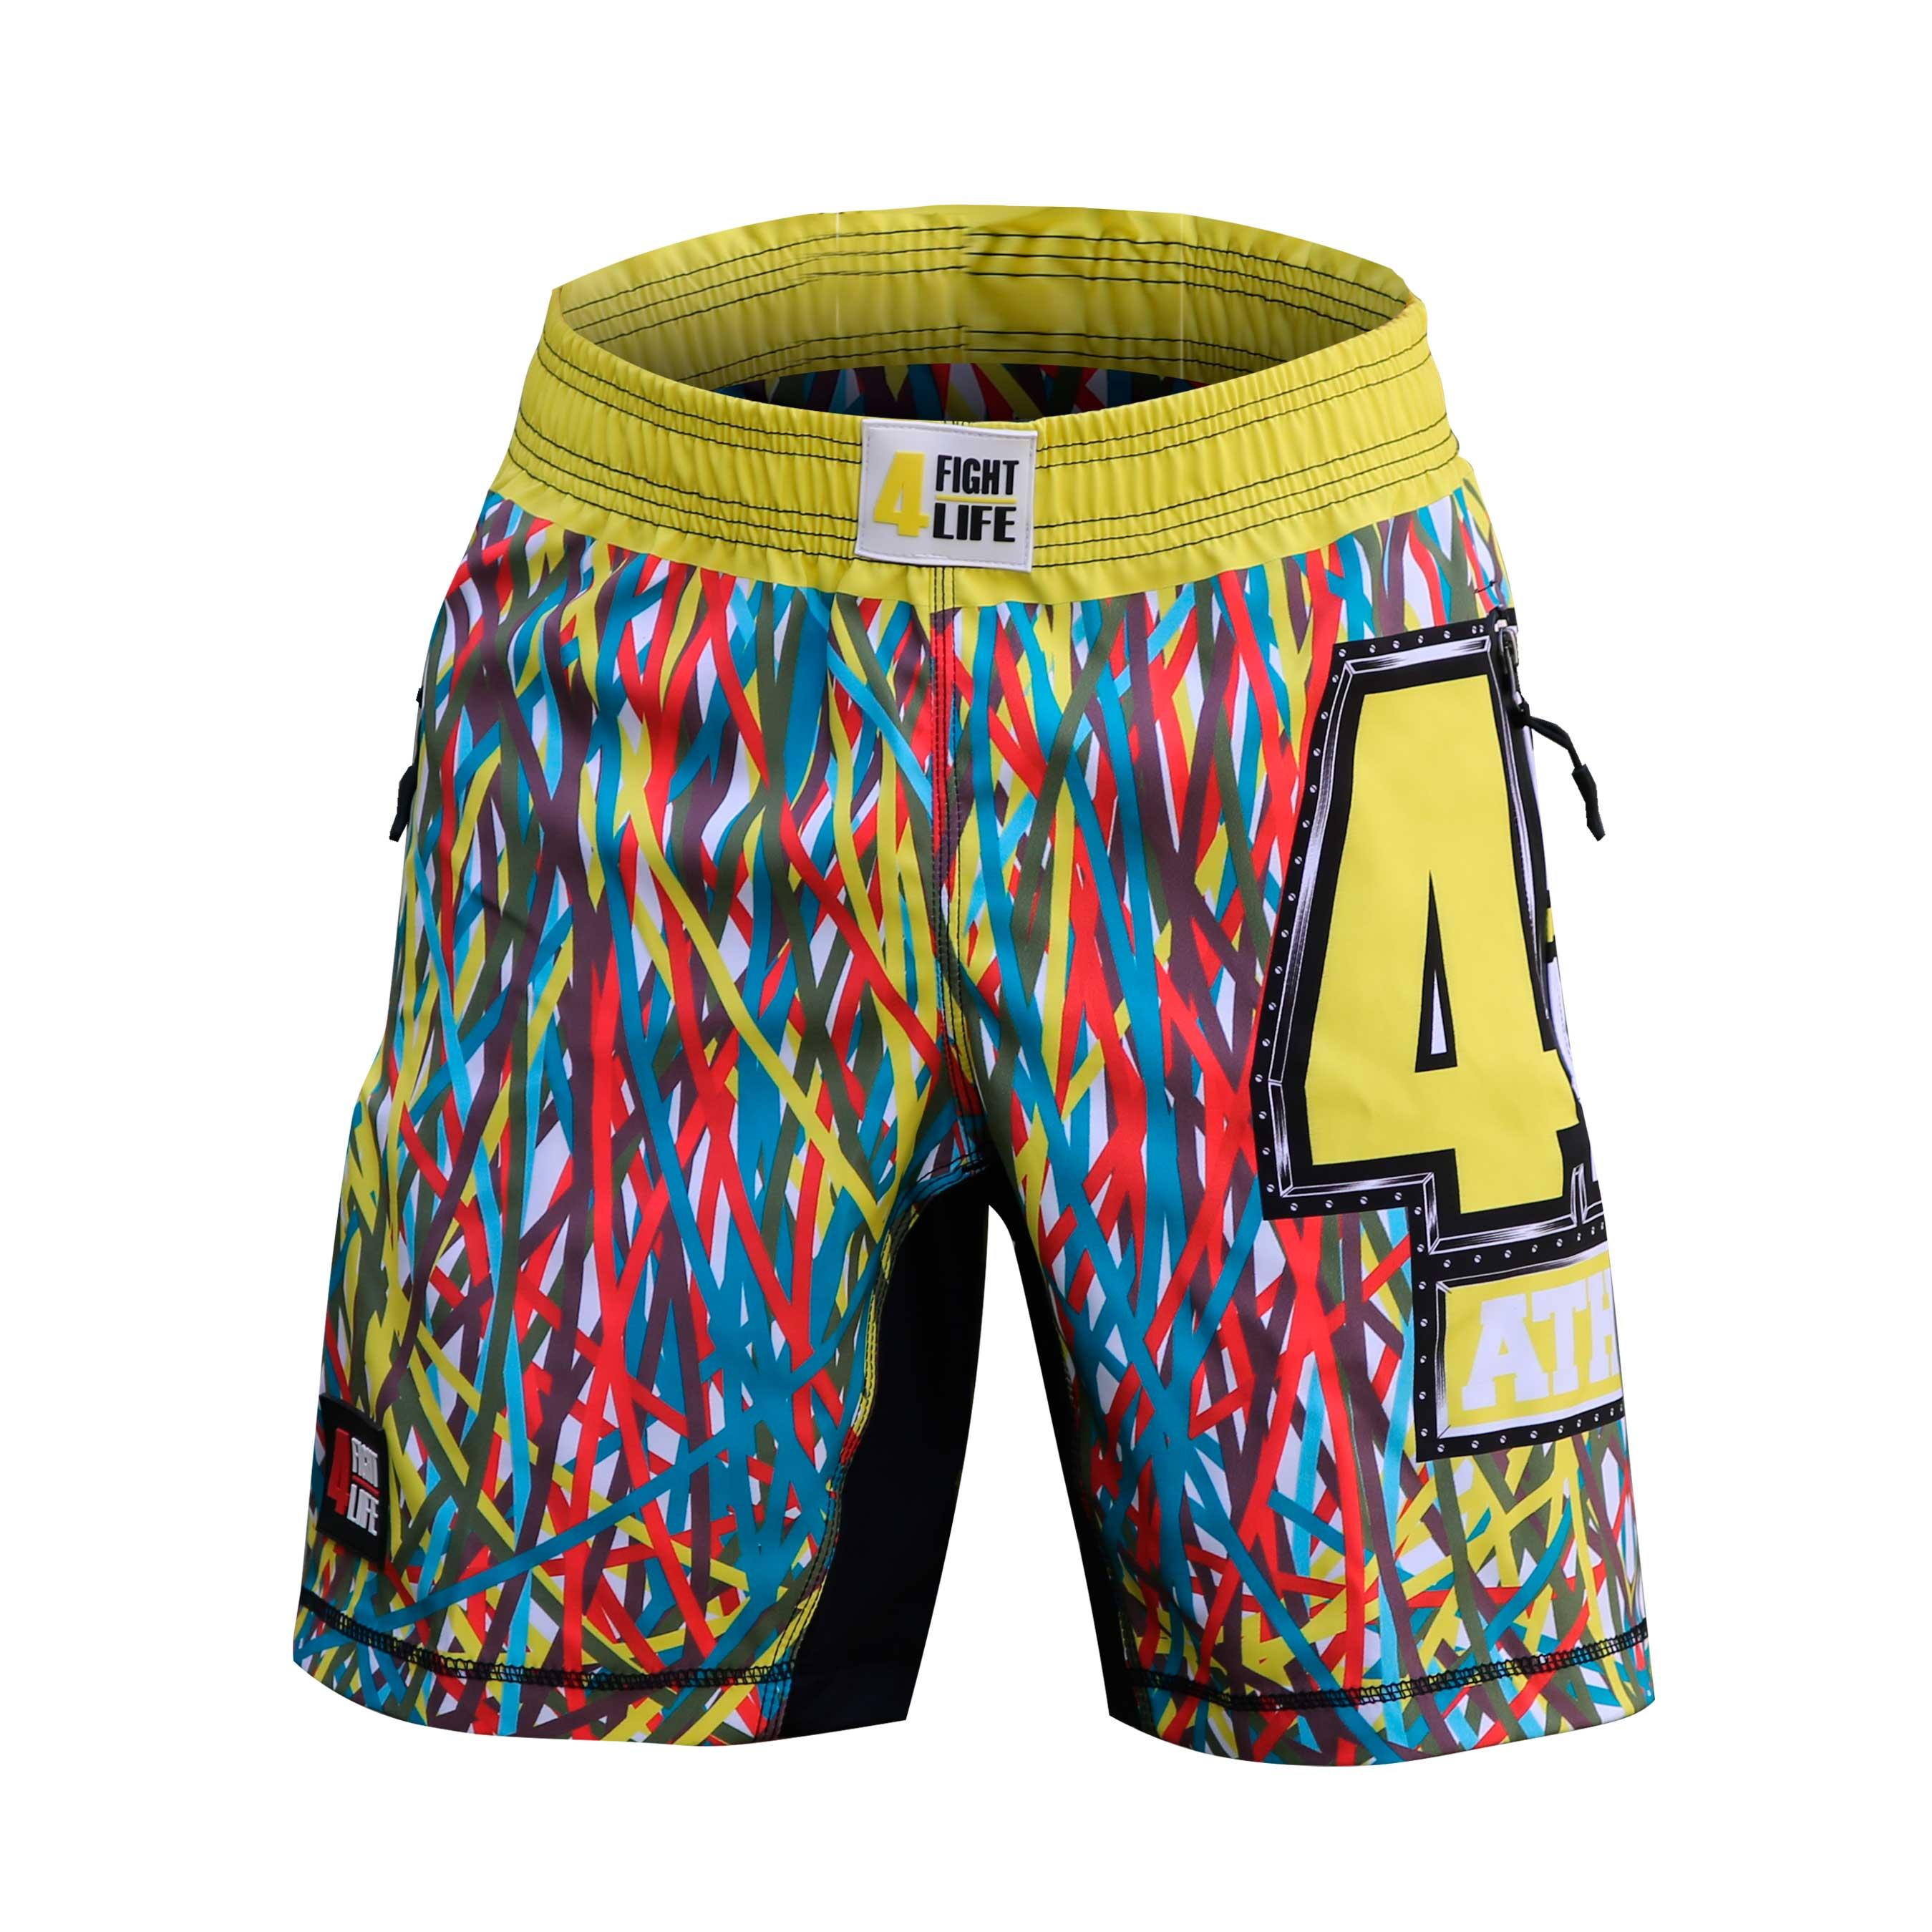 23e564e3cc10 Tienda online de ropa para deportistas | Fight4life.es